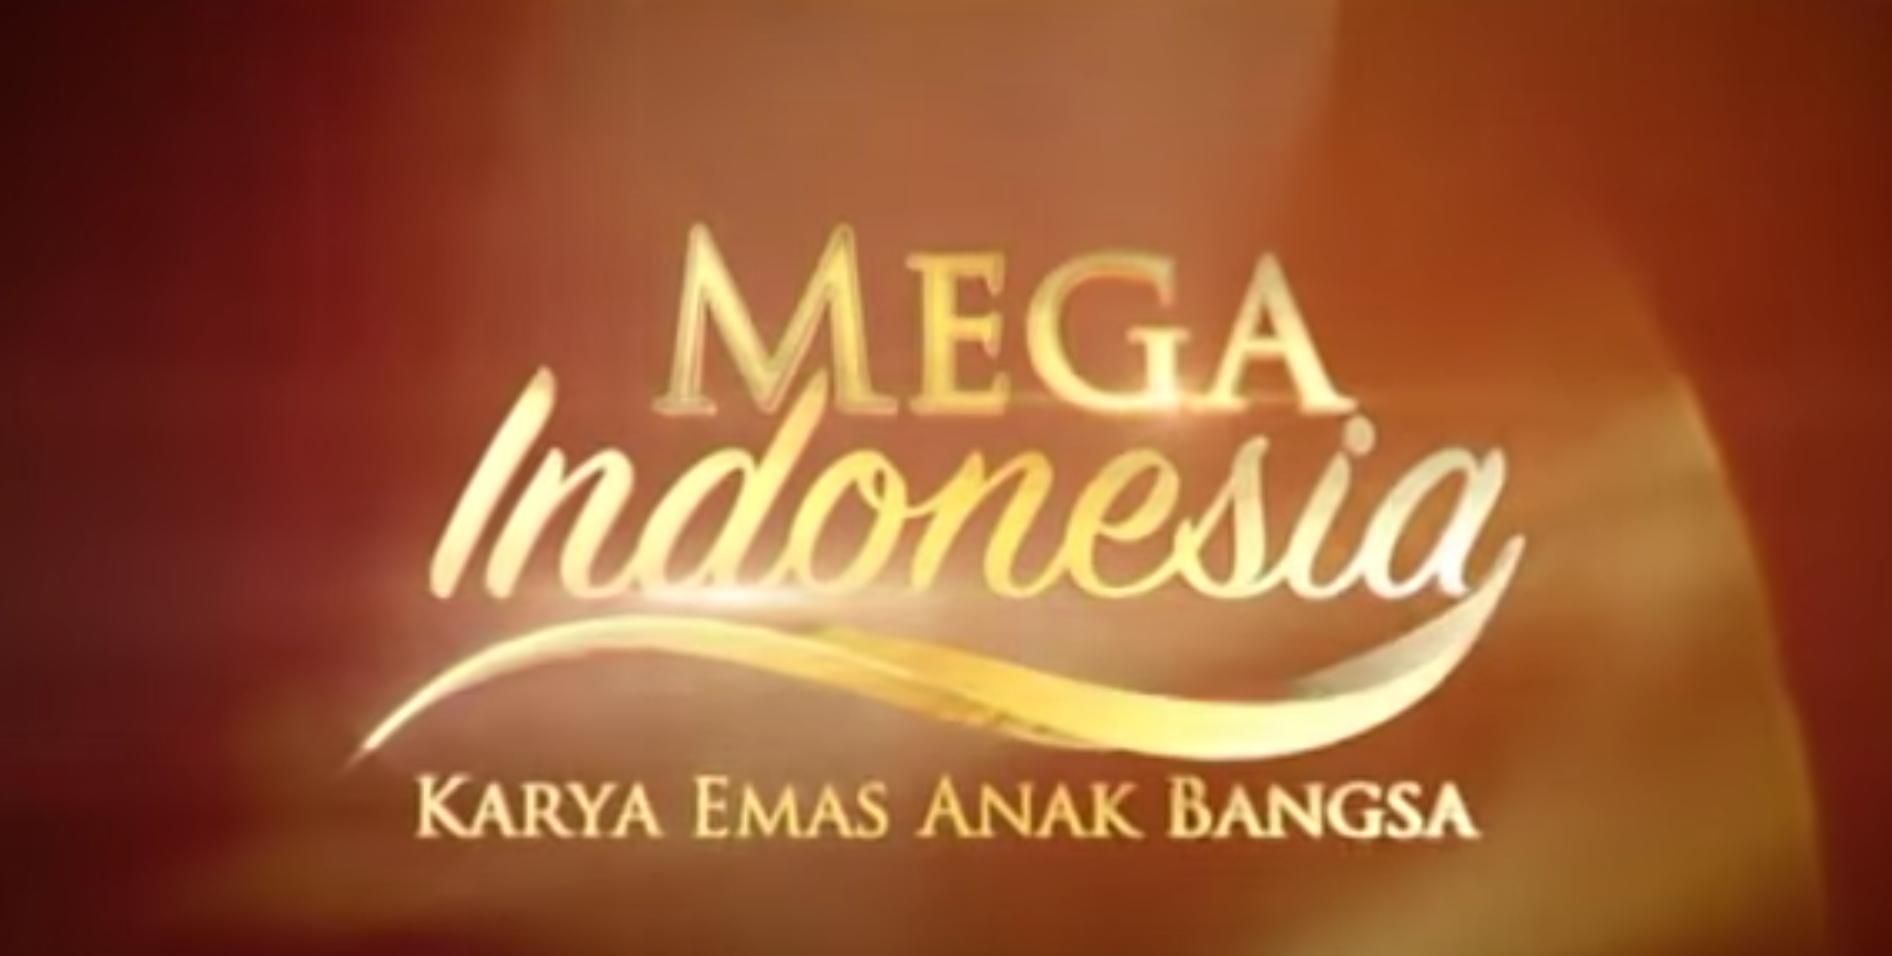 Mega Indonesia Segera di RTV